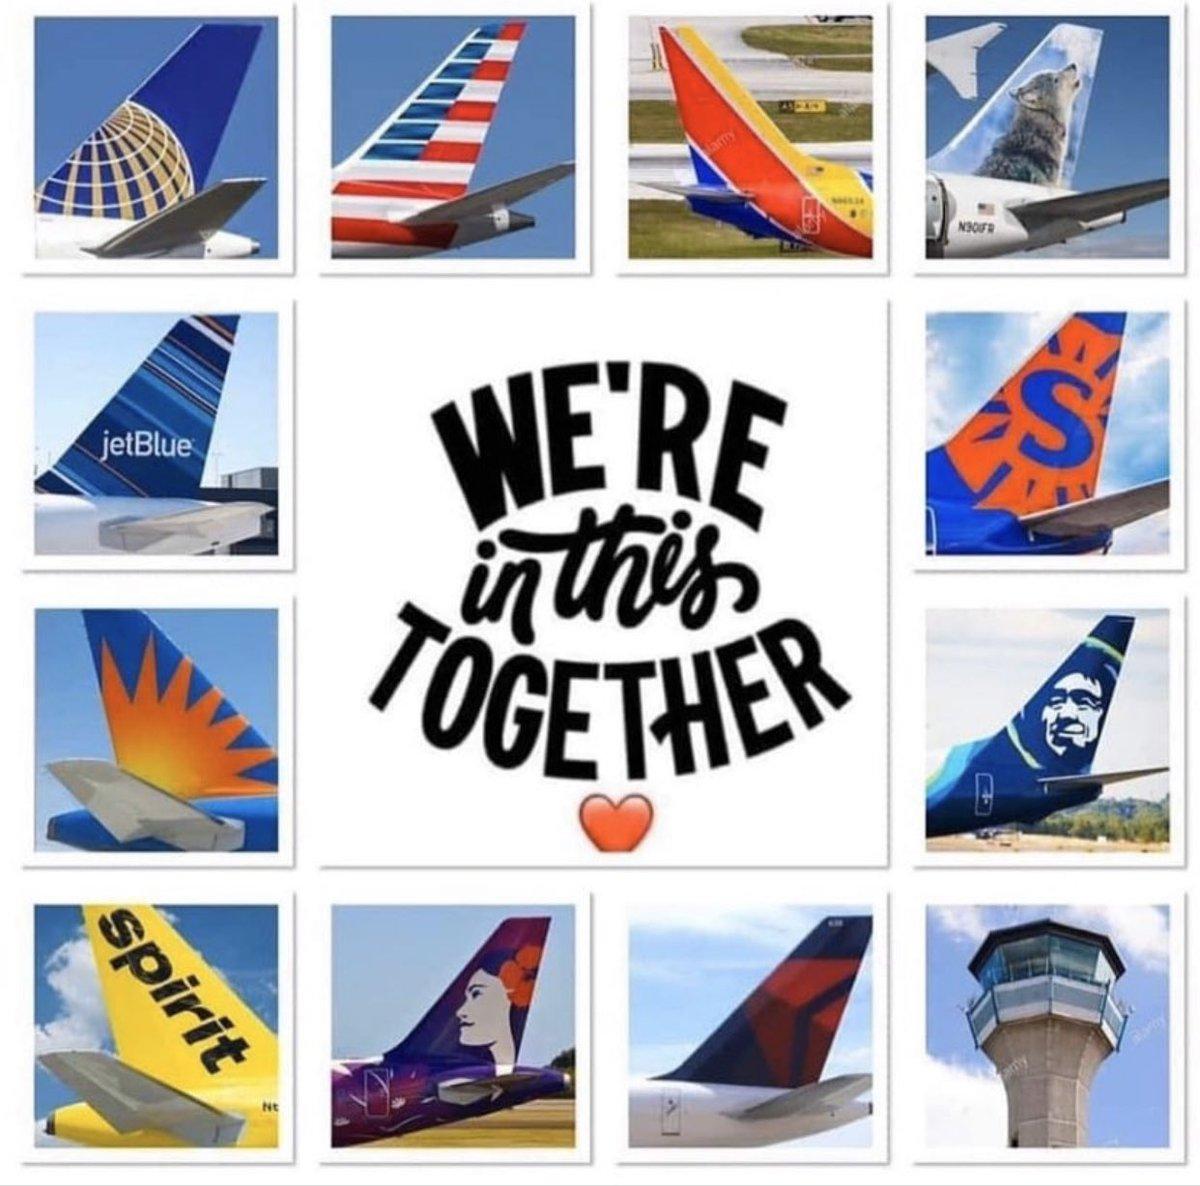 We will push forward together, UNITED we stand! As an industry we stand together. @JMRoitman @EWRmike @jeff_riedel160 @BsquaredUA @GregHart_UAL @Tobyatunited @weareunited